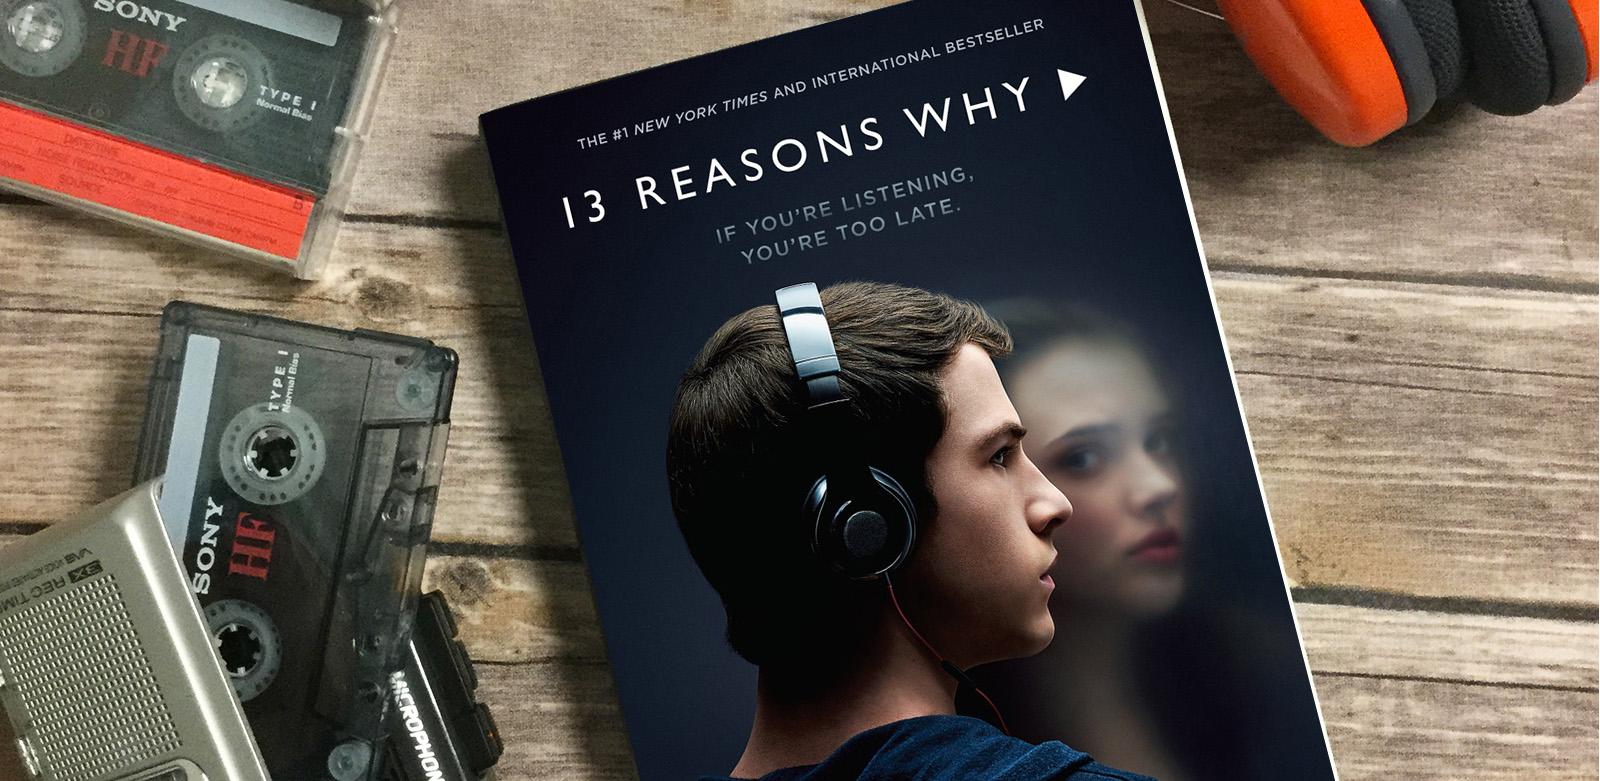 Best Series Music for hibernation season • 13 reasons why